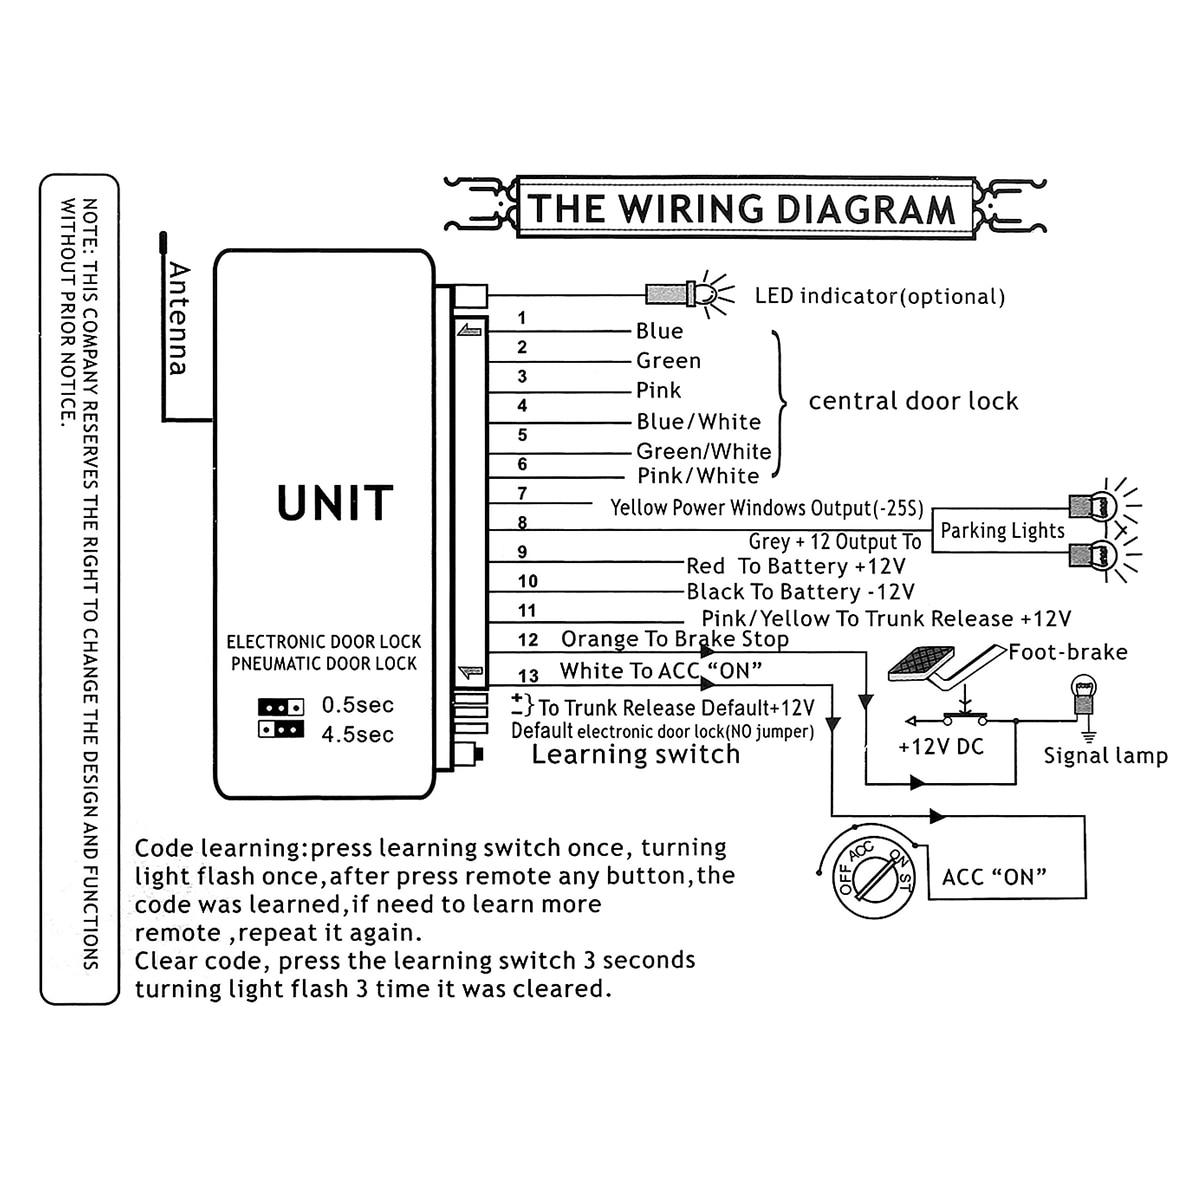 MG_4853] Vw Polo Central Locking Wiring Diagram Wiring DiagramSpoat Meric Eumqu Capem Mohammedshrine Librar Wiring 101